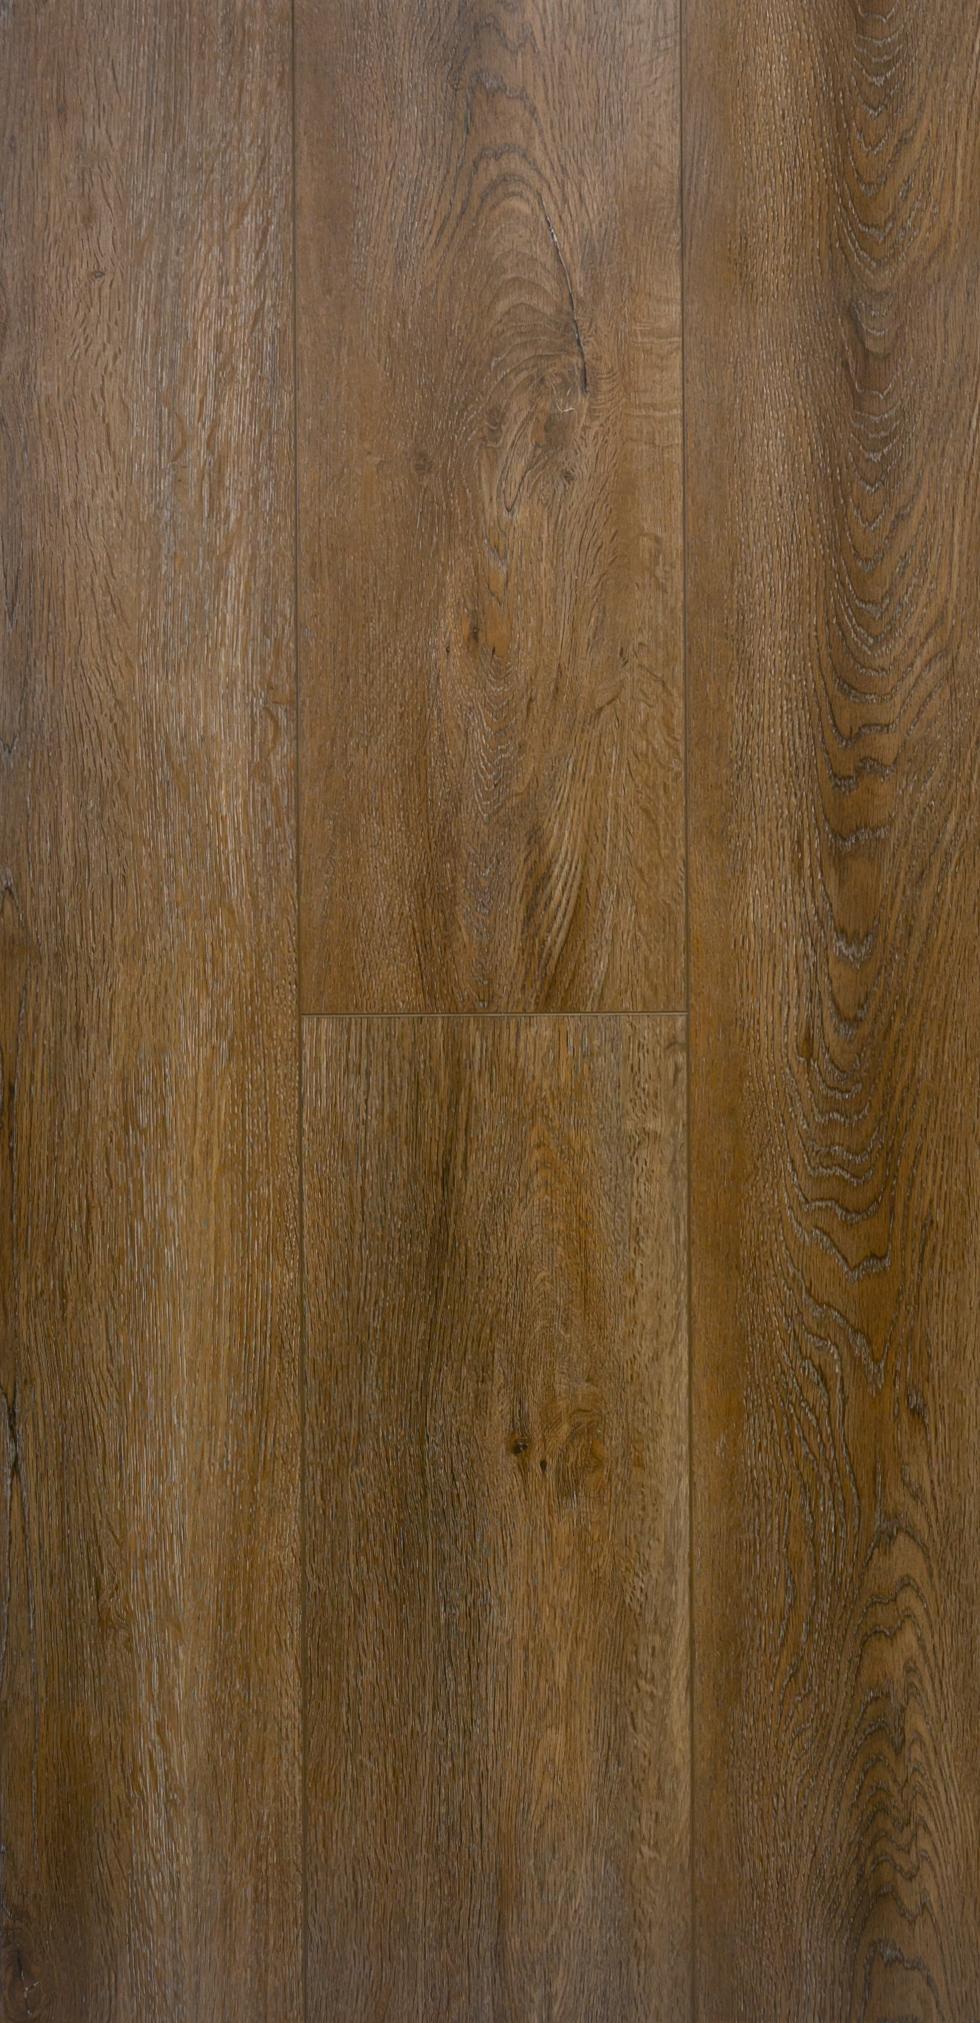 Cost Less Carpet Luxury Vinyl, Who Makes Rhino Laminate Flooring